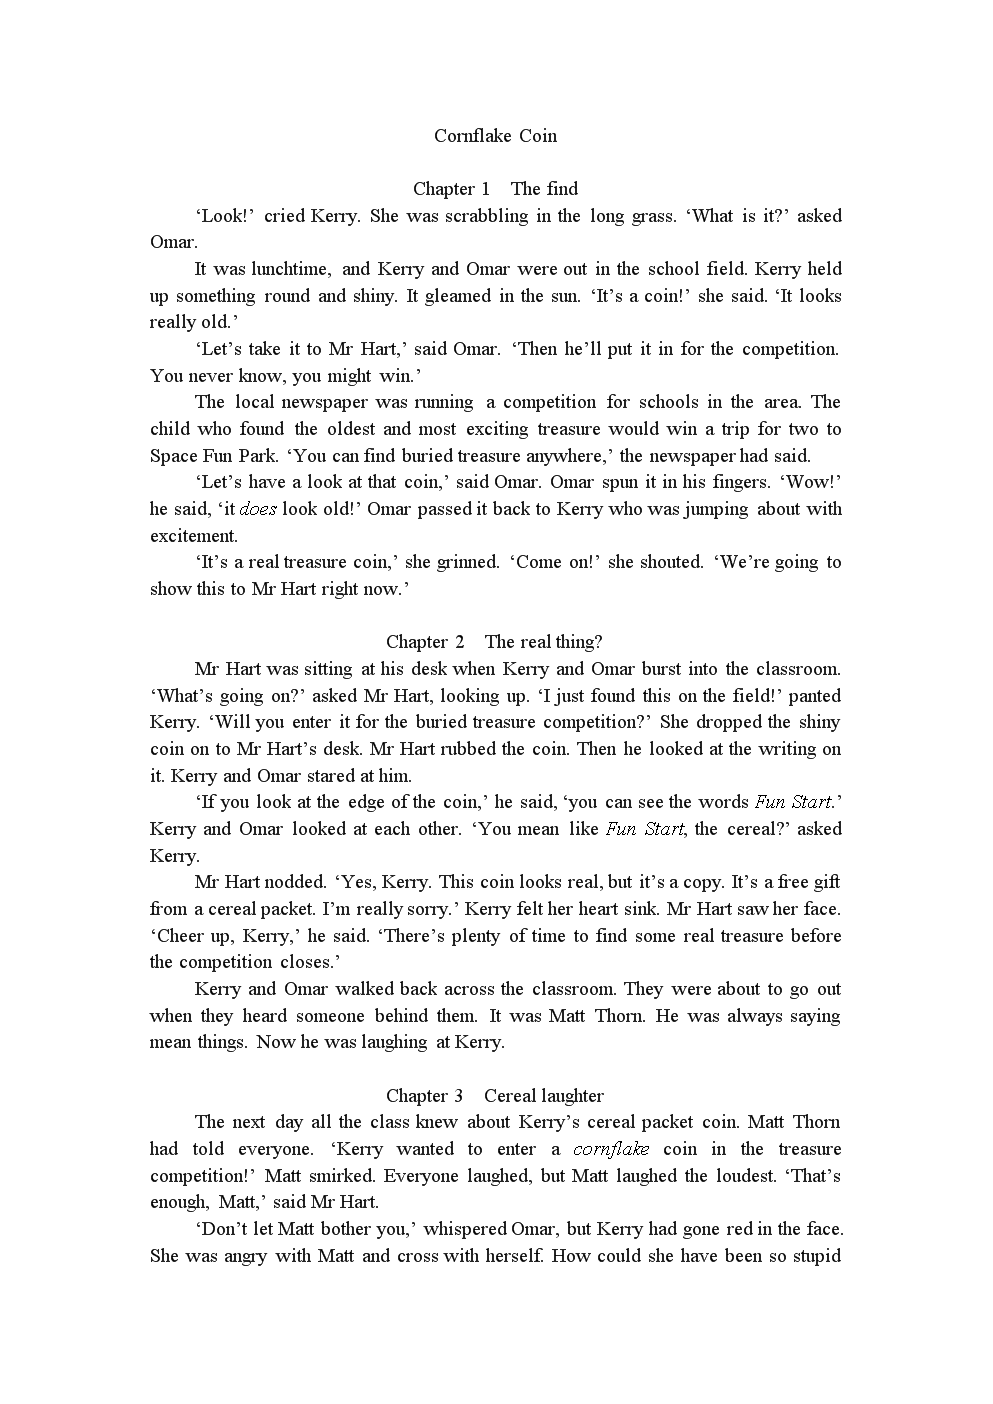 Cornflake Coin典范英语.doc